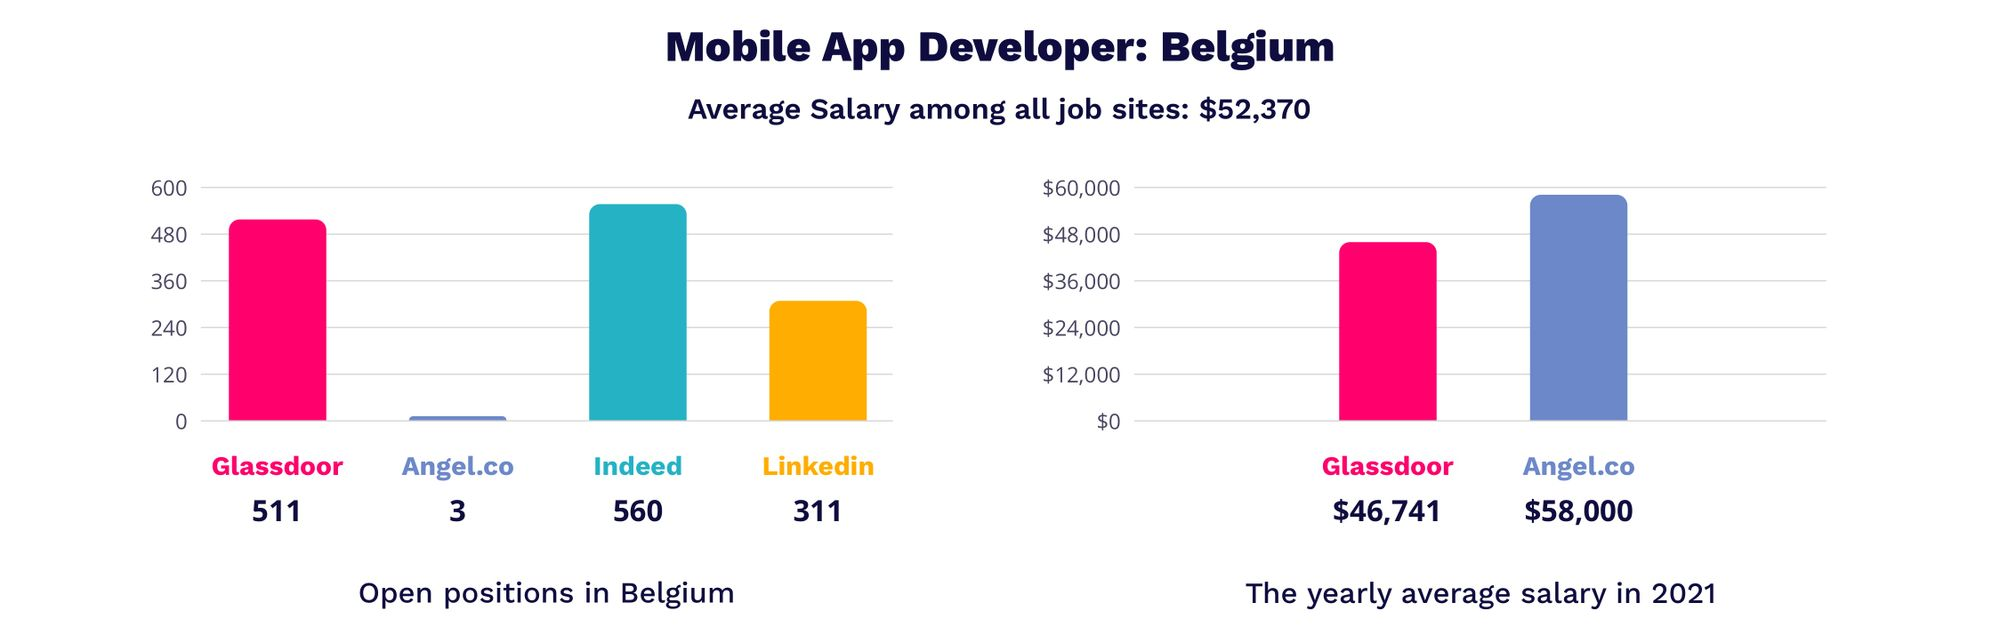 mobile app developer salary in Belgium